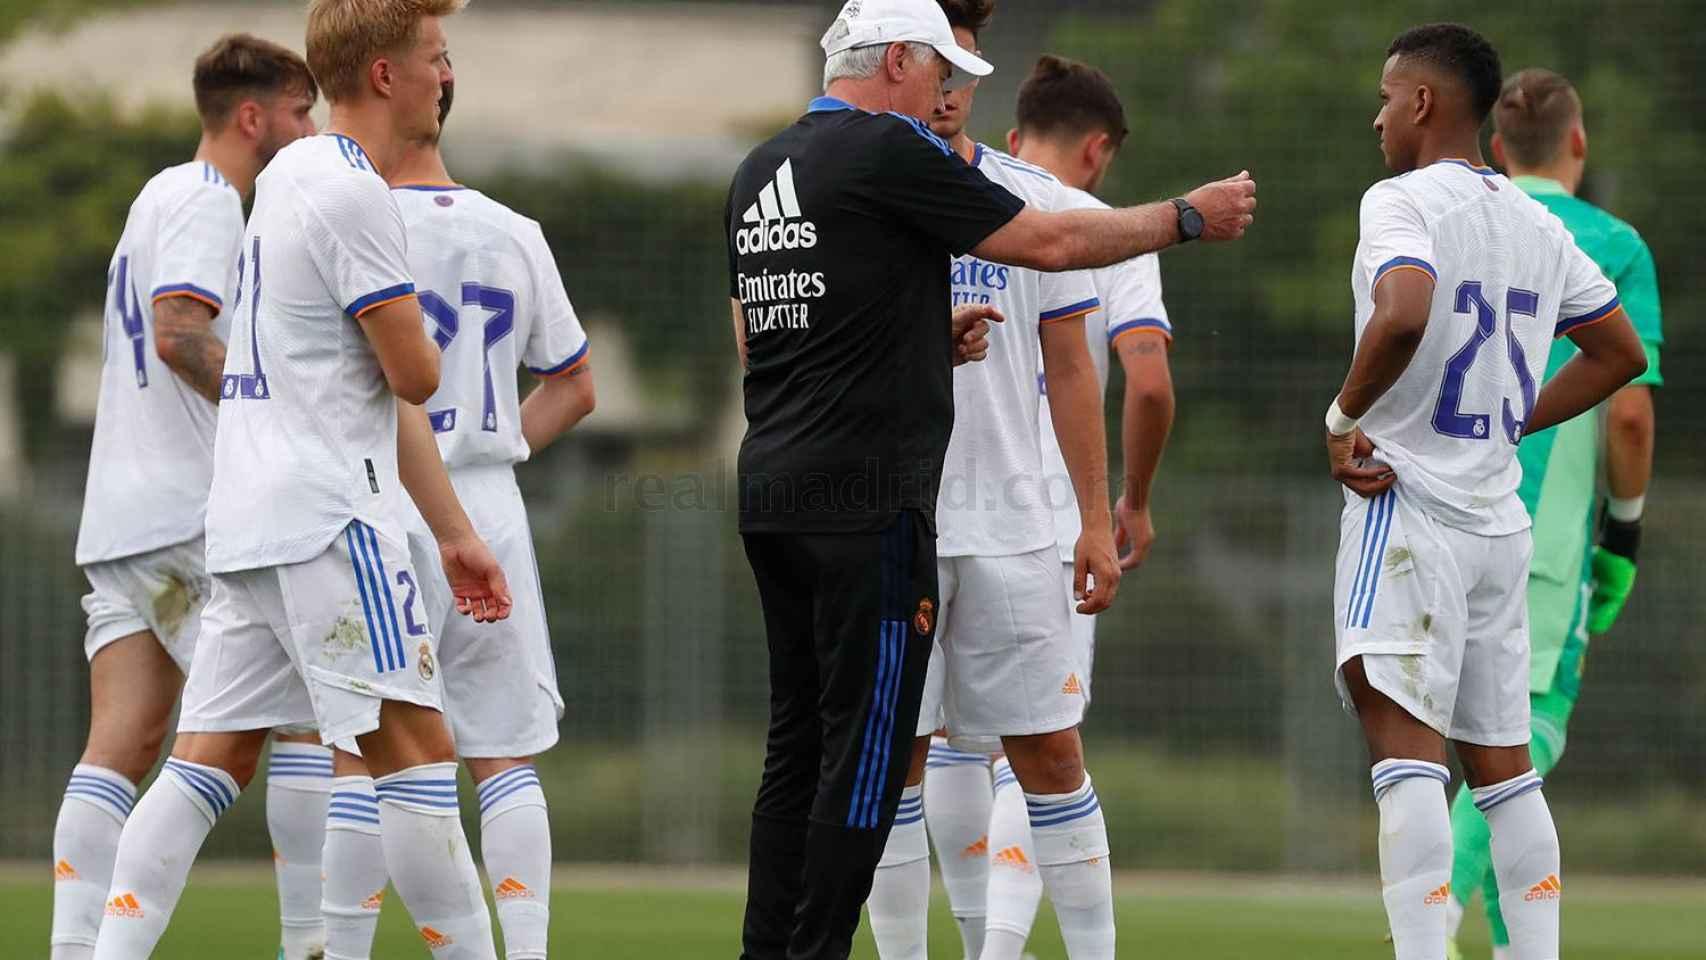 Carlo Ancelotti da indicaciones a sus jugadores